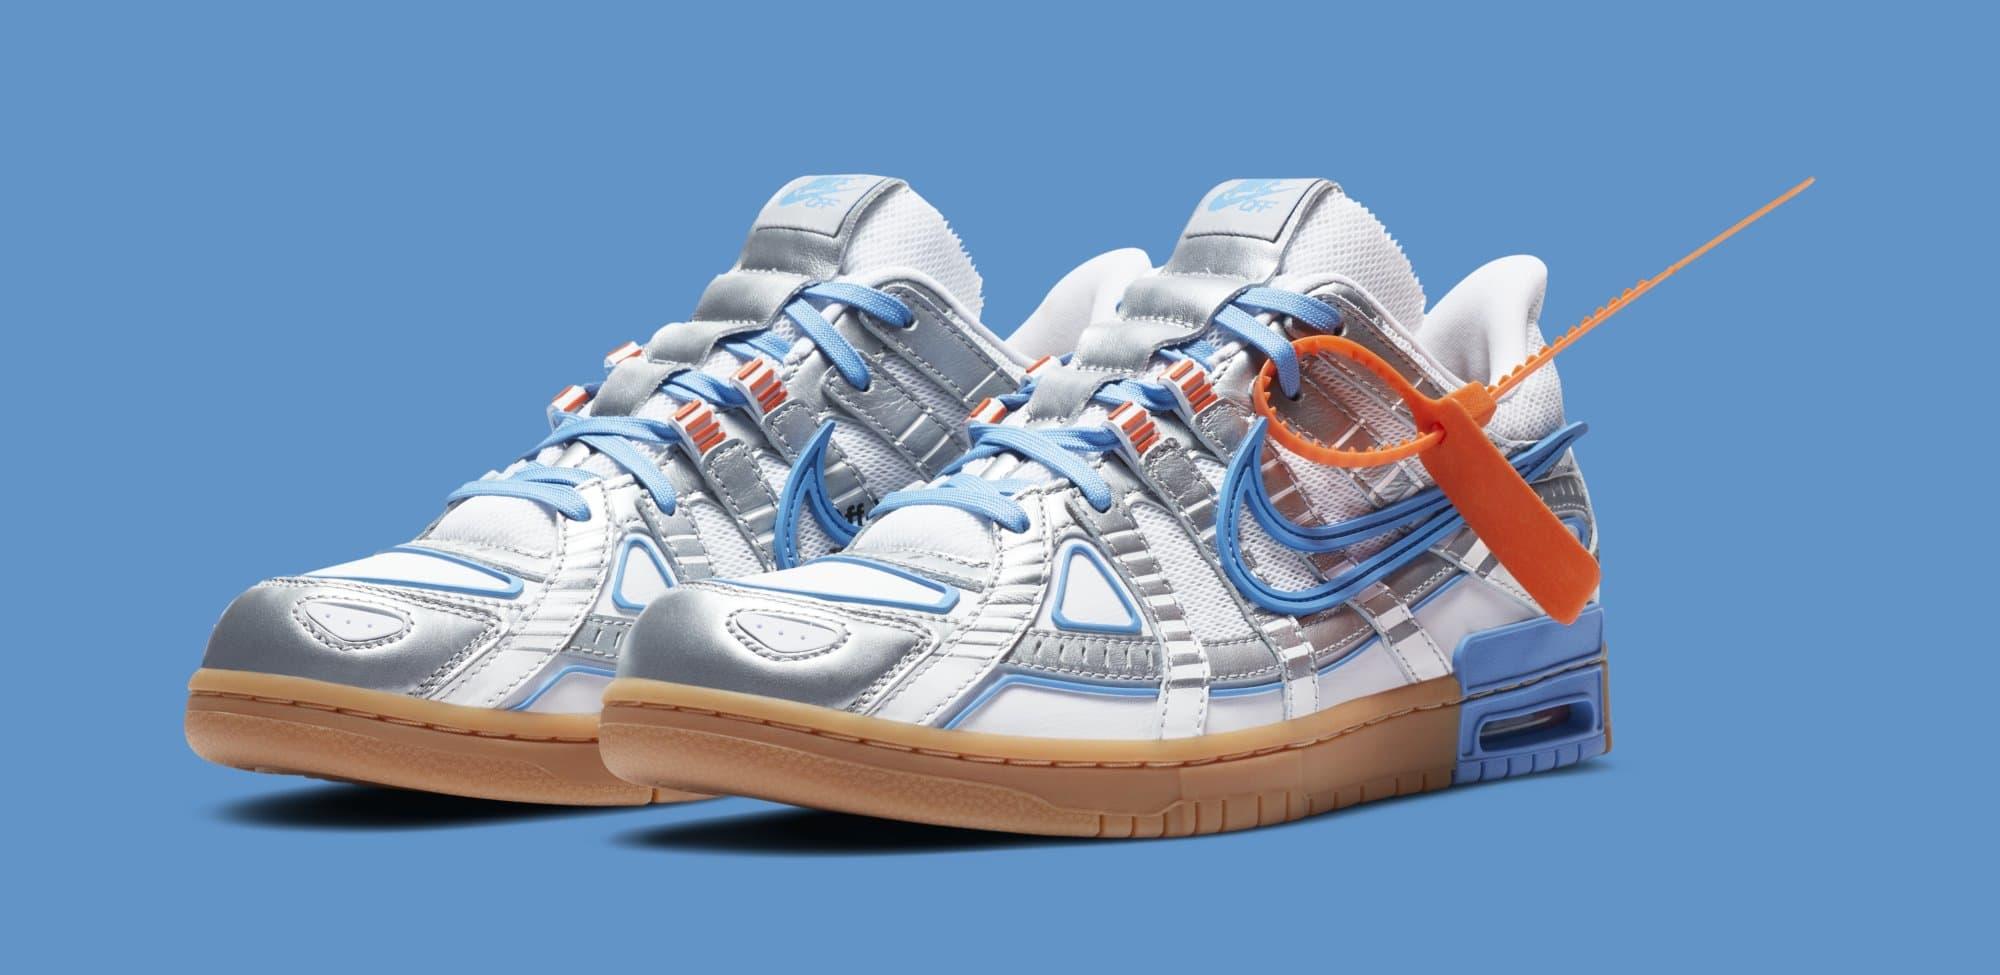 Off-White x Nike Air Rubber Dunk 'University Blue' CU6015-100 Pair